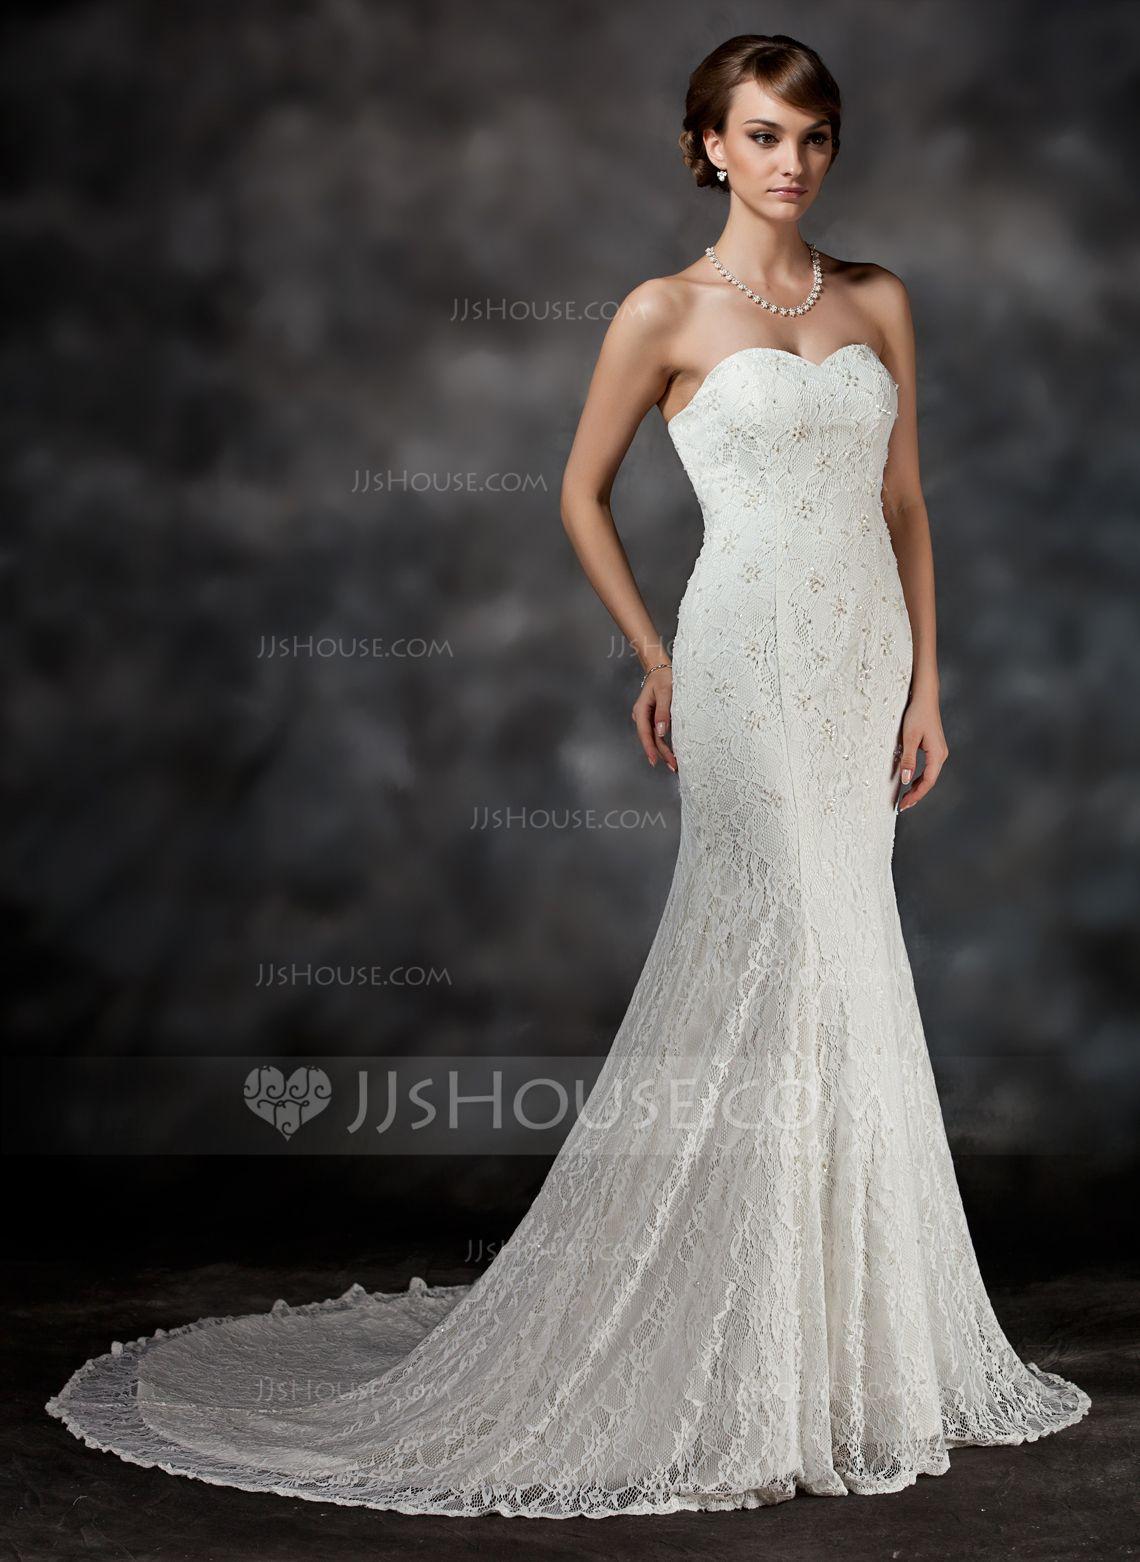 Trumpet/Mermaid Sweetheart Chapel Train Satin Lace Wedding Dress With Beading (002017421) - JJsHouse